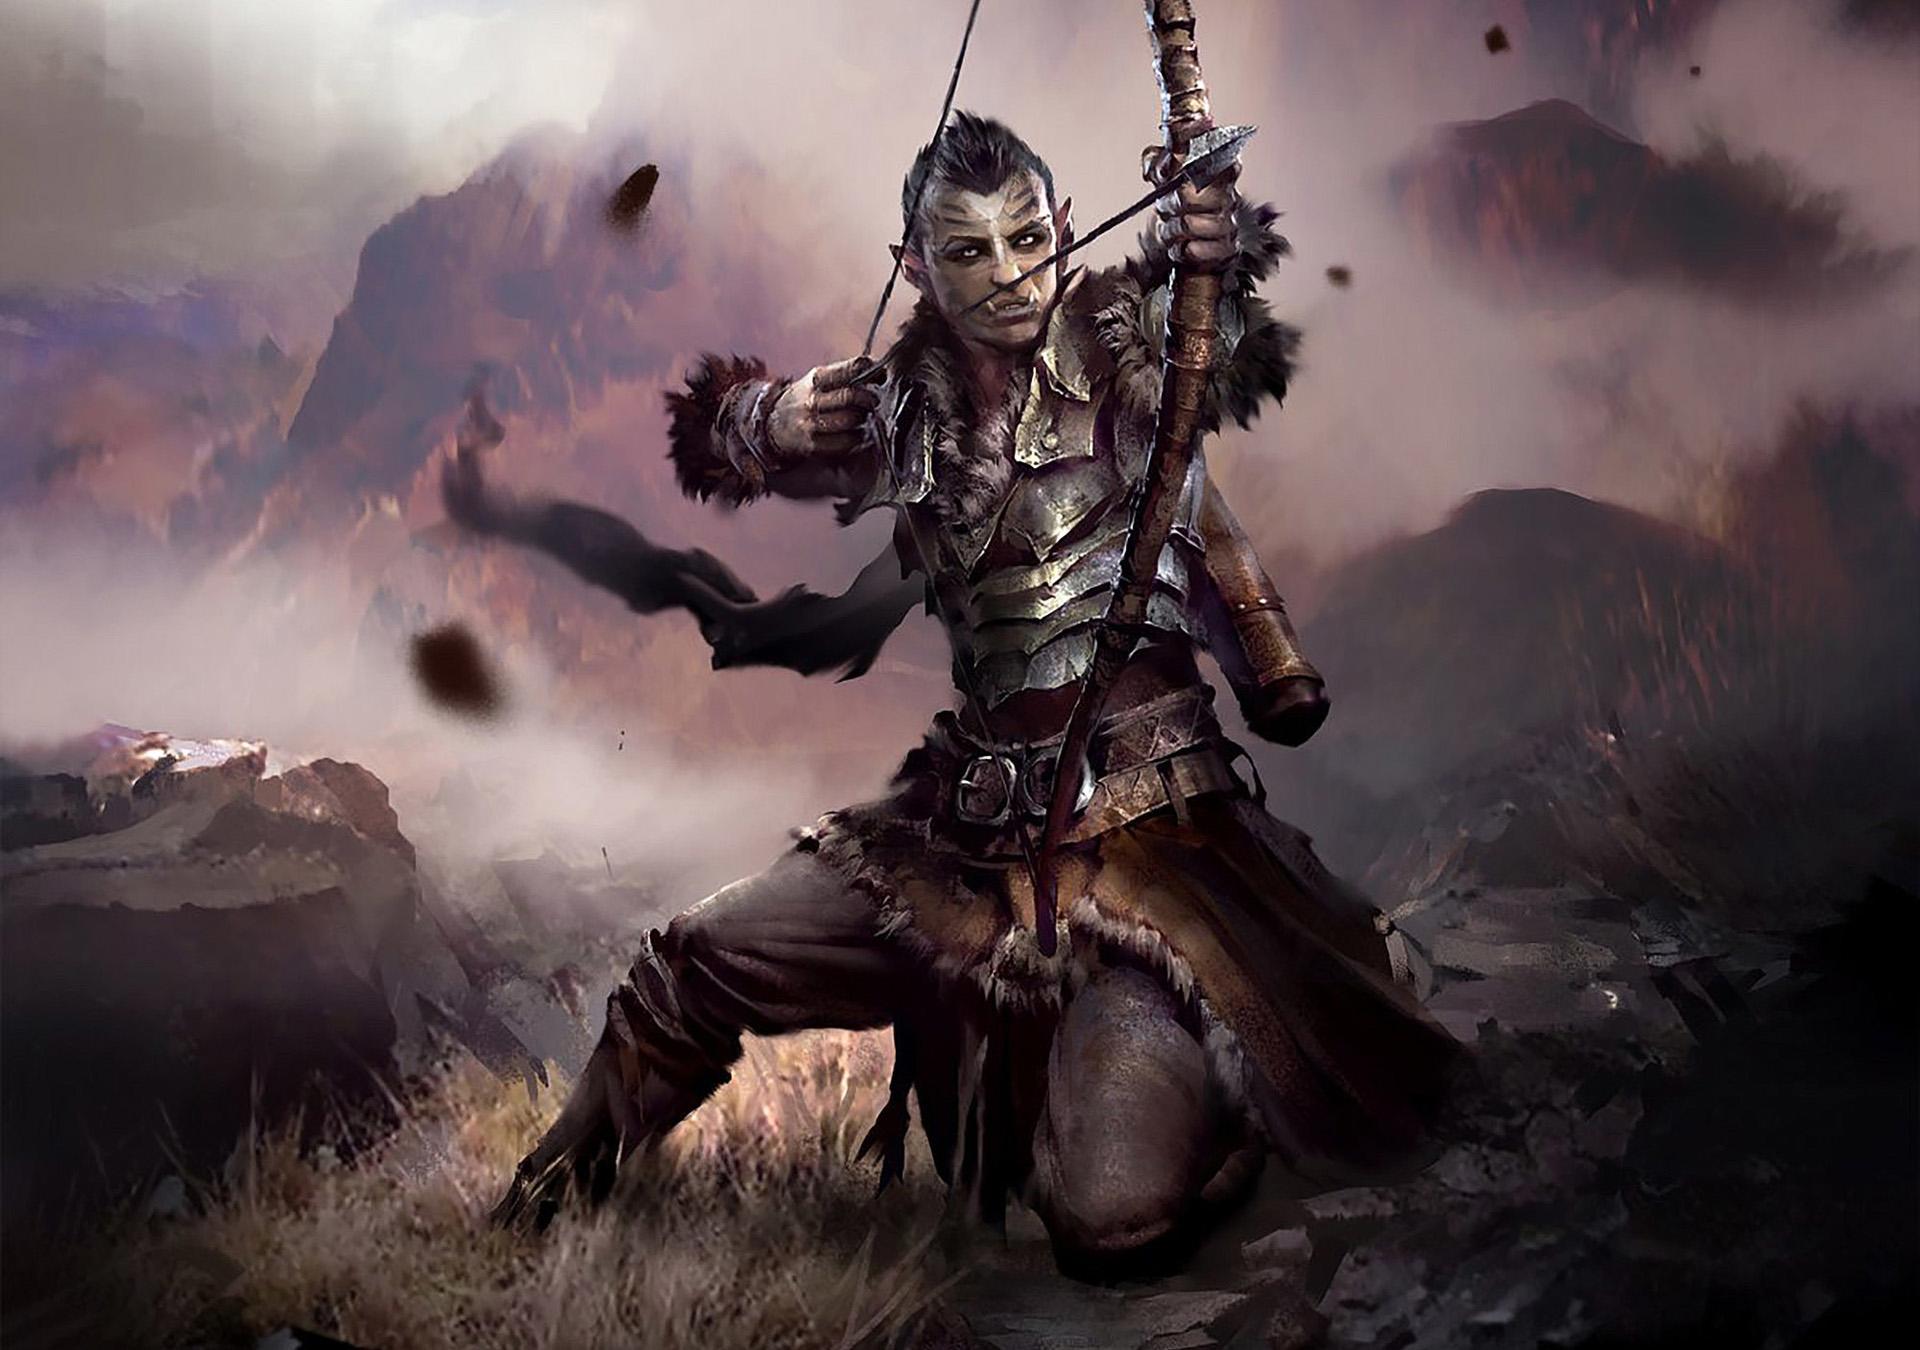 The Elder Scrolls: Legends HD Wallpapers, Pictures, Images